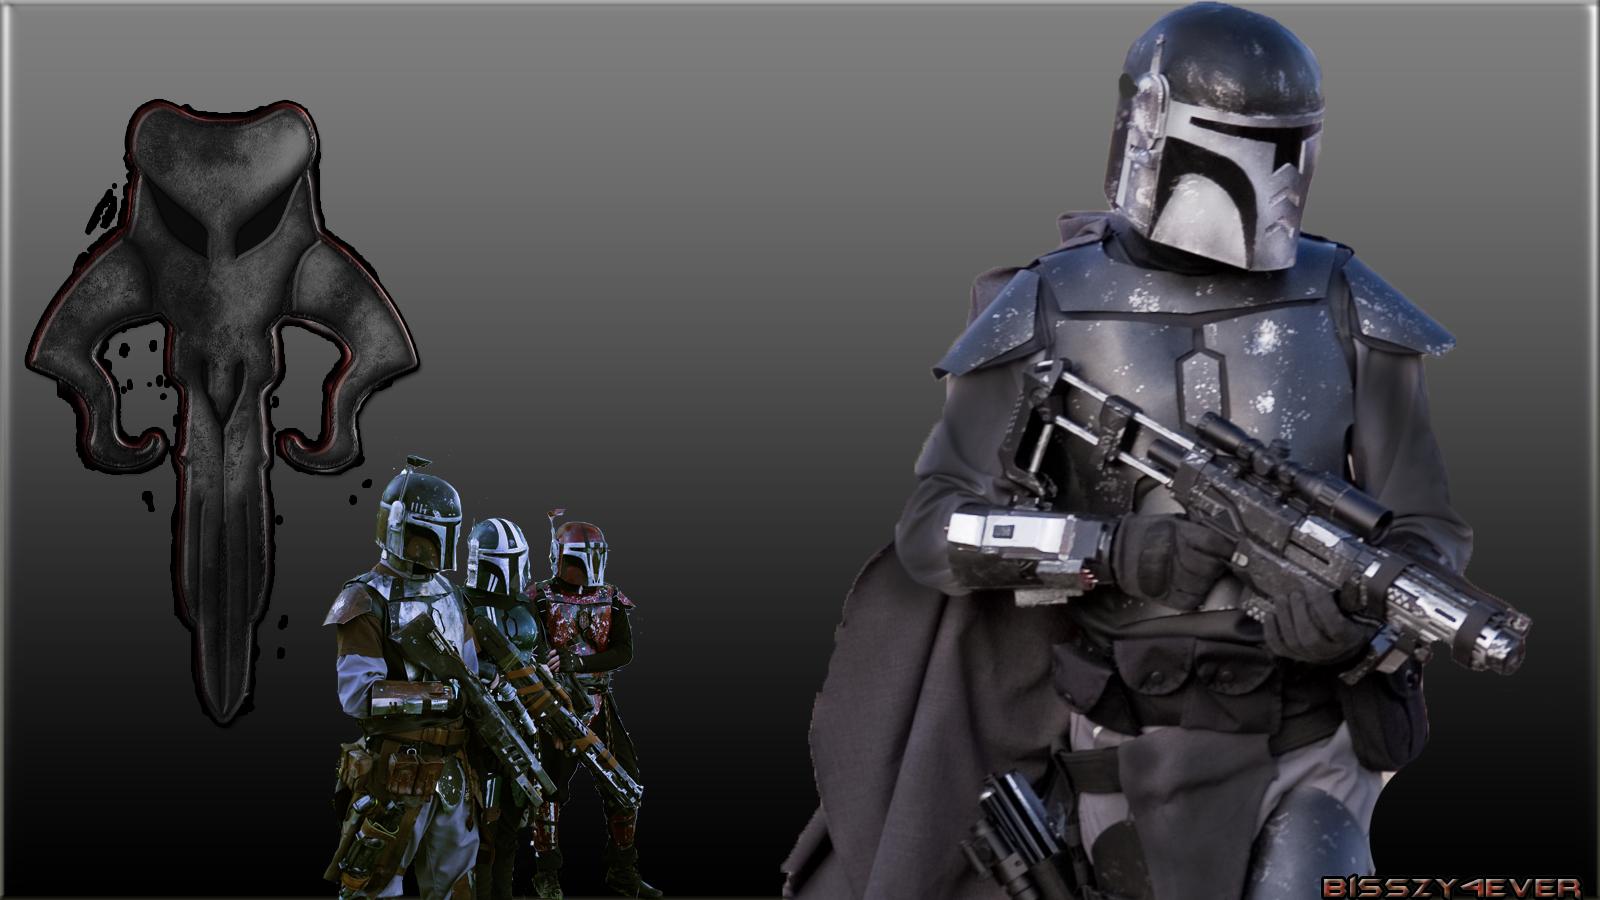 download Madalorian Wallpaper image 501st Legion Vaders Fist 1600x900